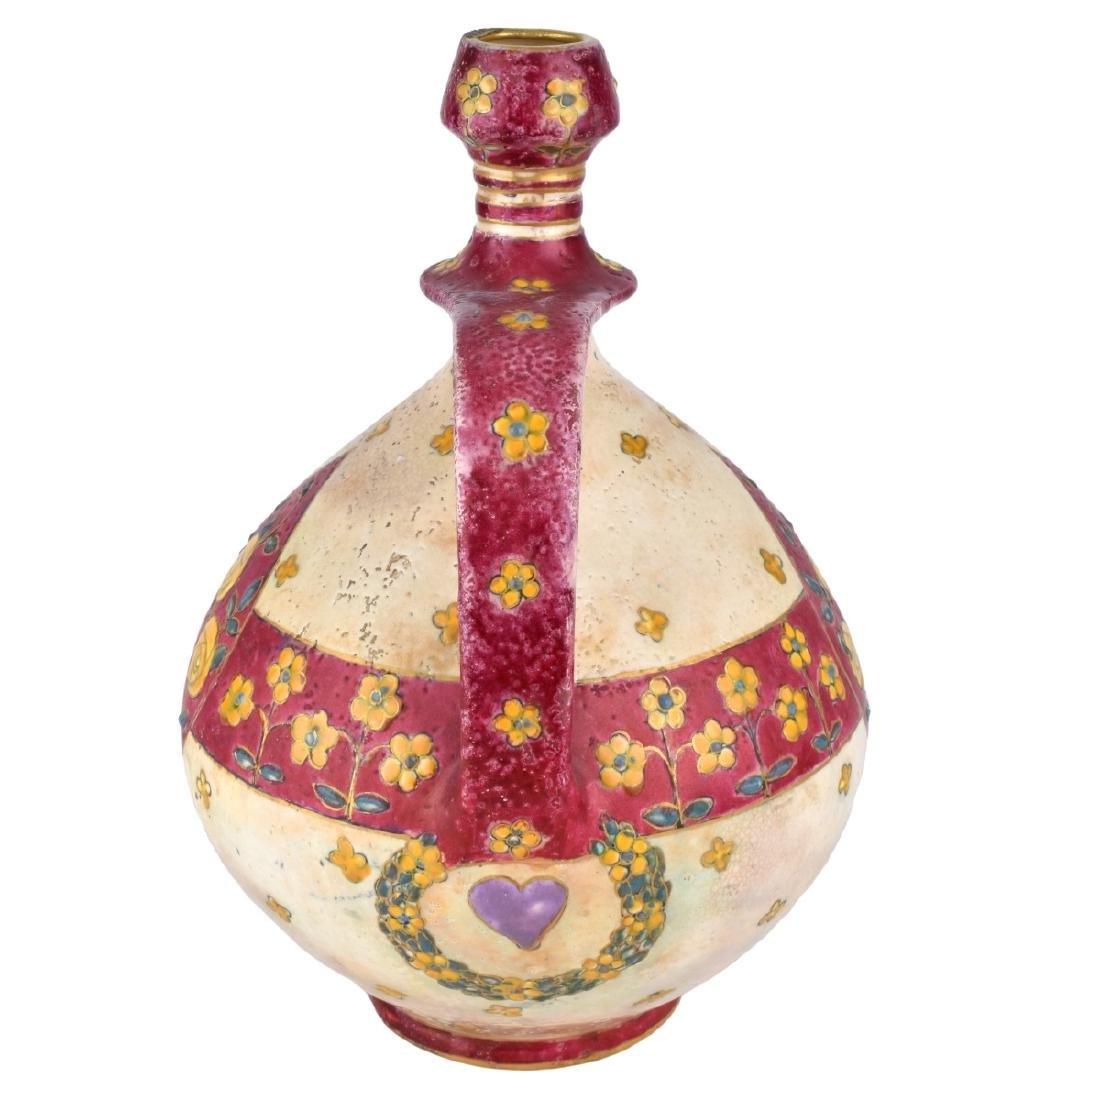 Large Amphora Enameled Pottery Pitcher - 2